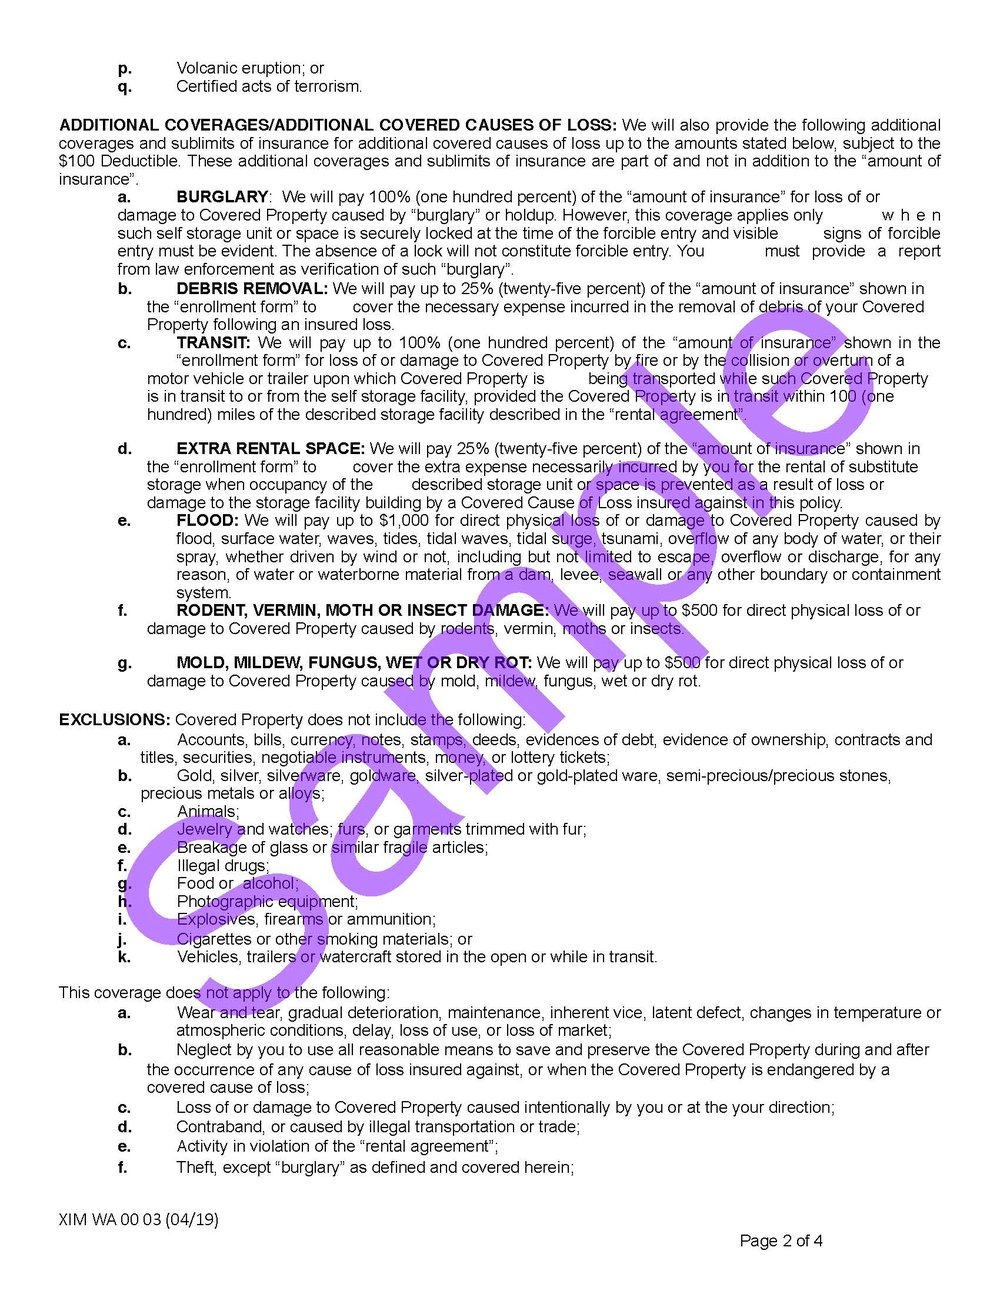 XIM WA 00 03 04 19 Washington Certificate of InsuranceSample_Page_2.jpg